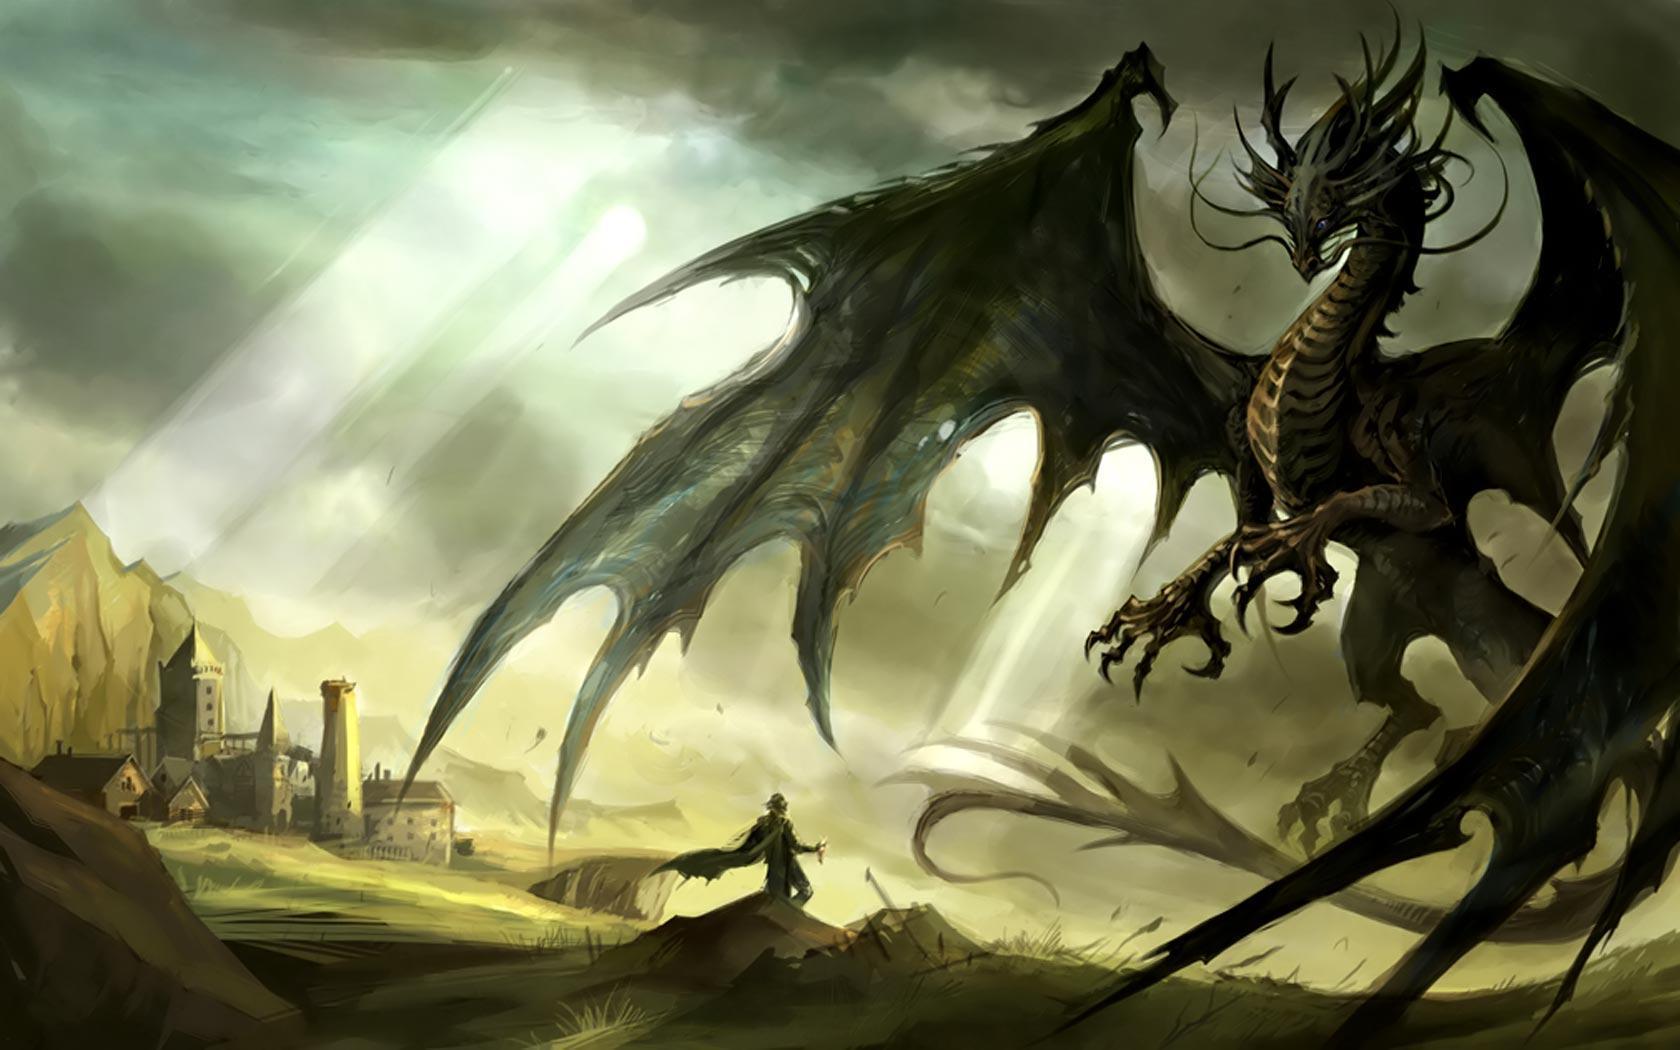 dragons wallpapers hd - wallpaper cave